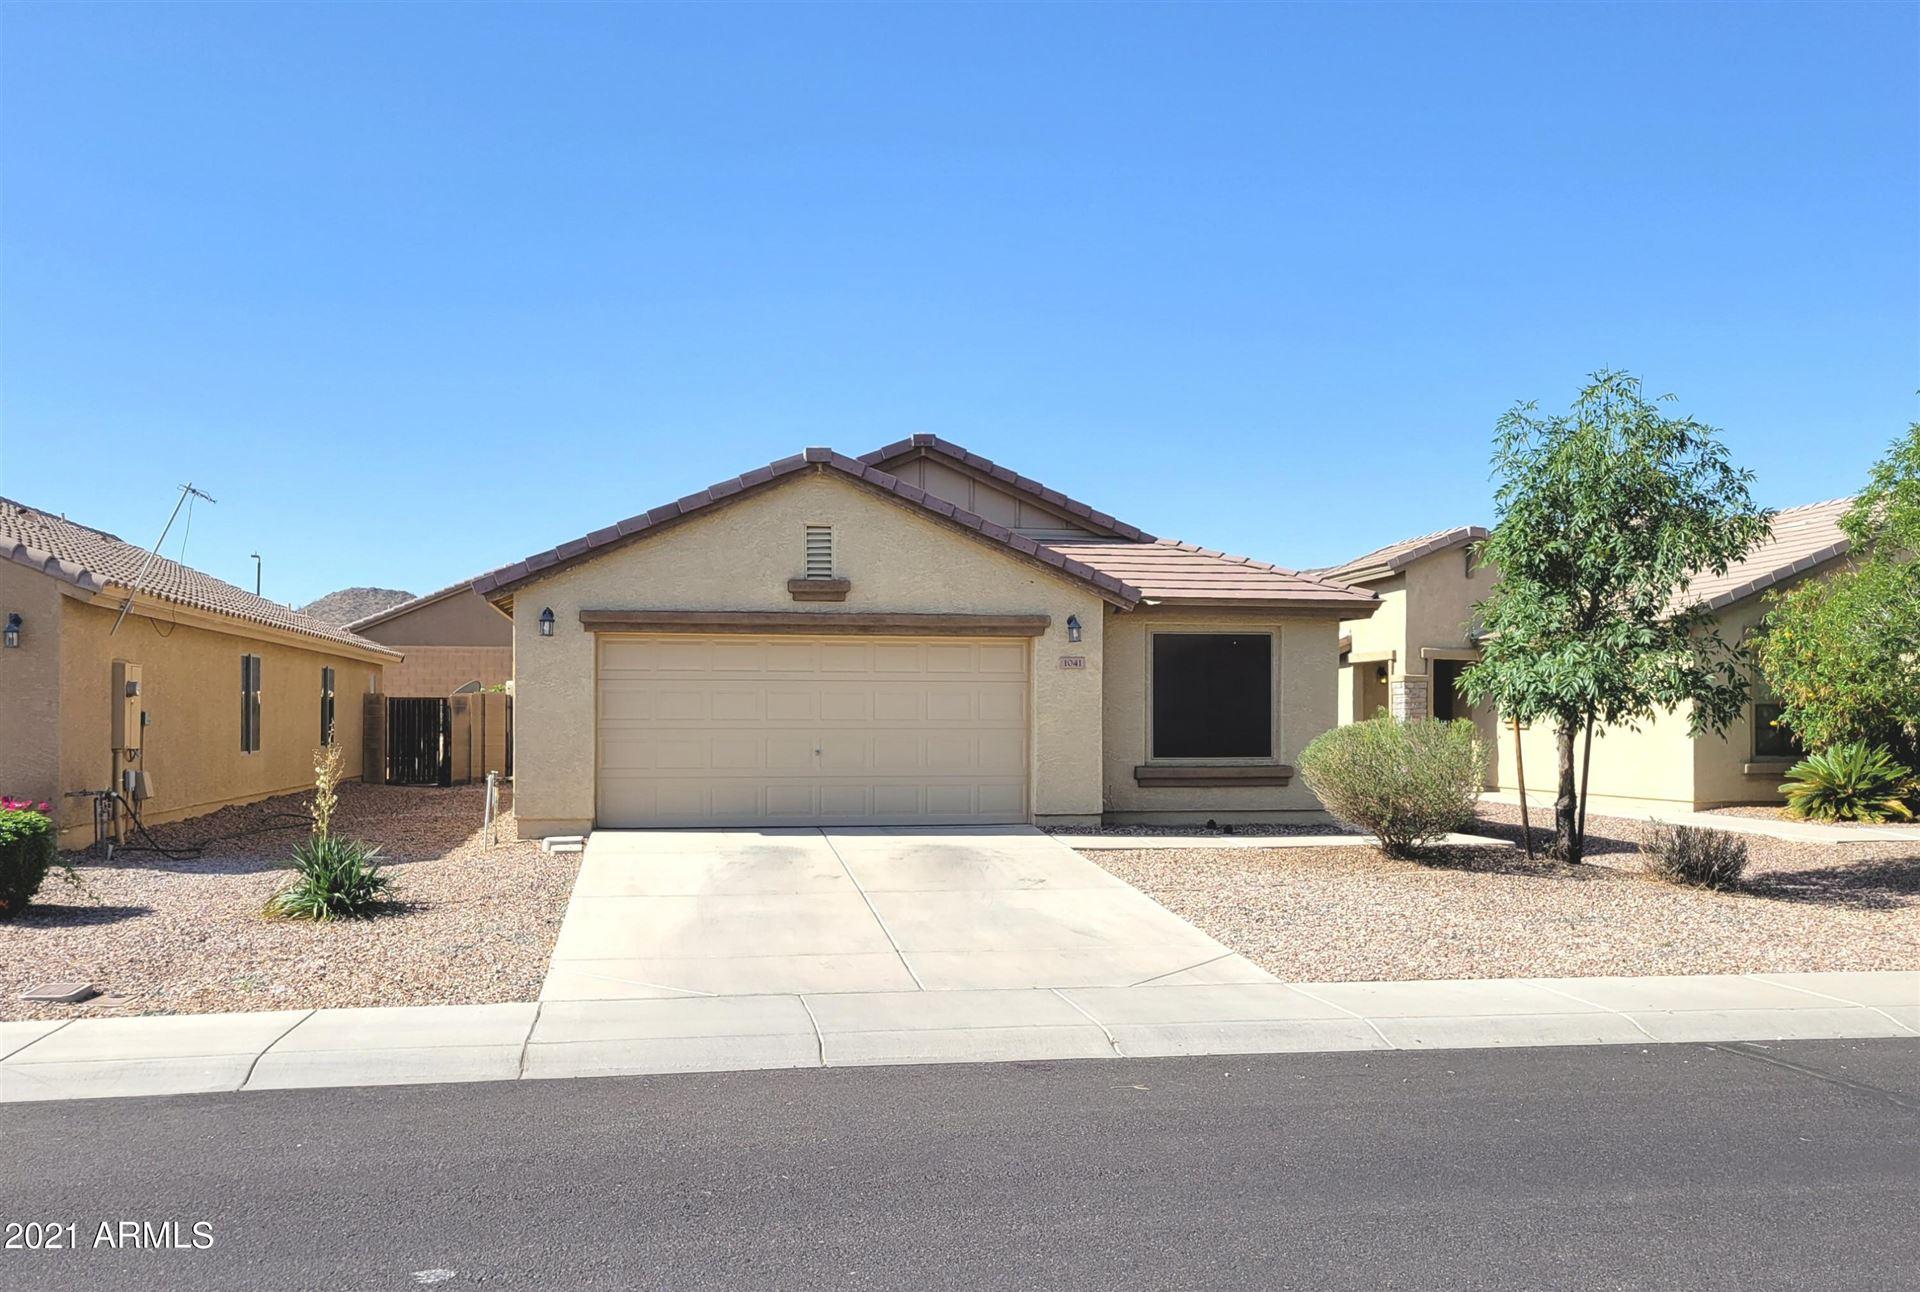 Photo of 1041 W DESERT HILLS Drive, San Tan Valley, AZ 85143 (MLS # 6232122)